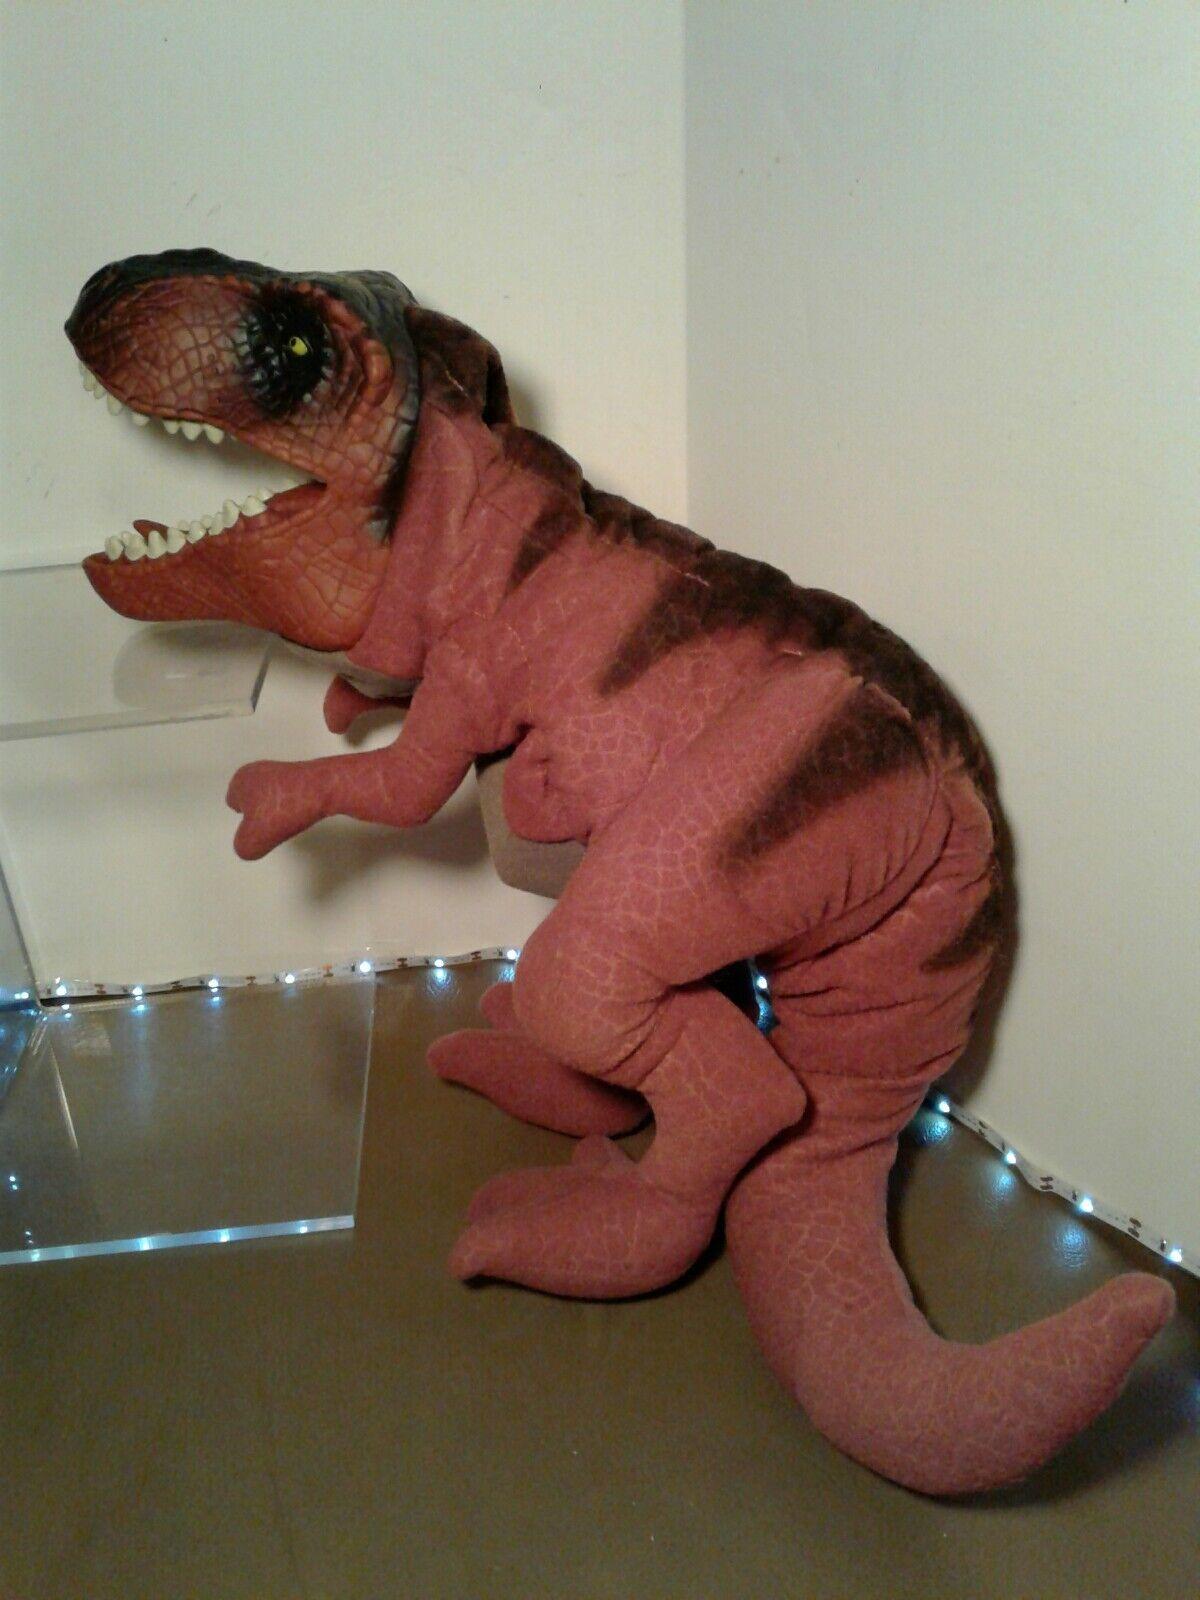 Jurassic park der verlorenen welt t - rex - dinosaurier ganzkörper - hand marionette hasbro 1996